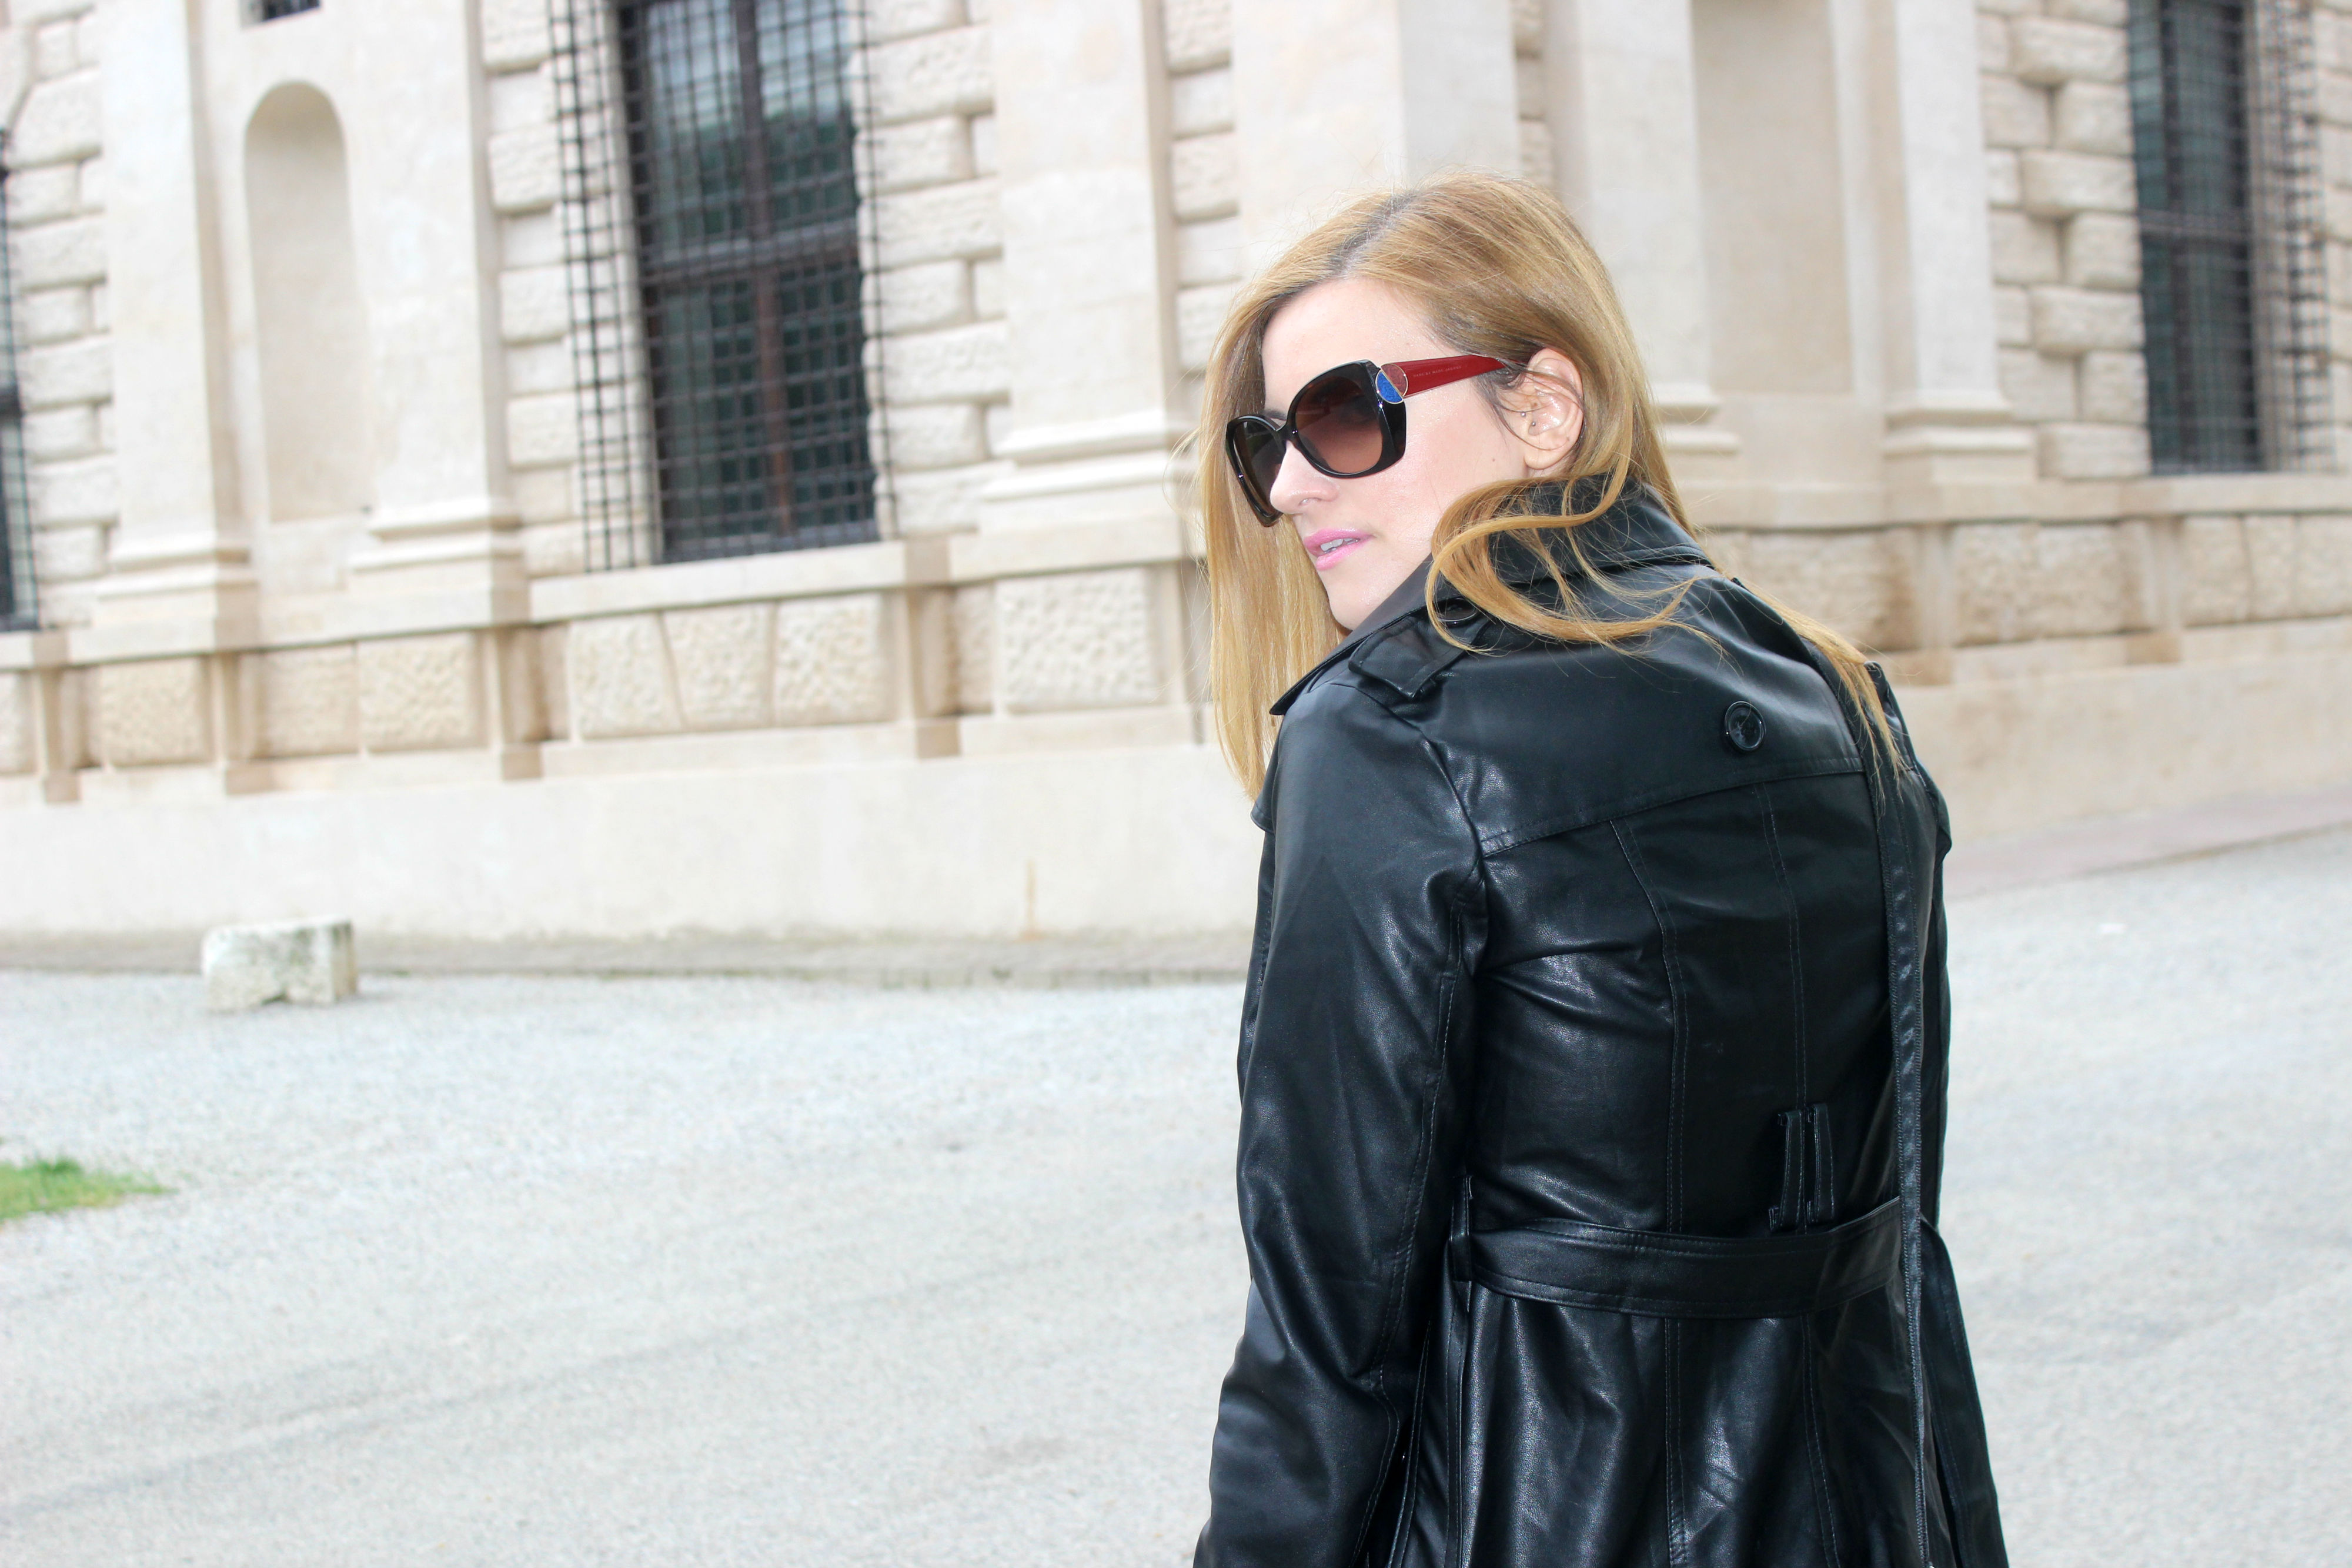 elisabettabertolini-baco-da-seta-outfit-leathertrench-marcjacobs-sunglasses12